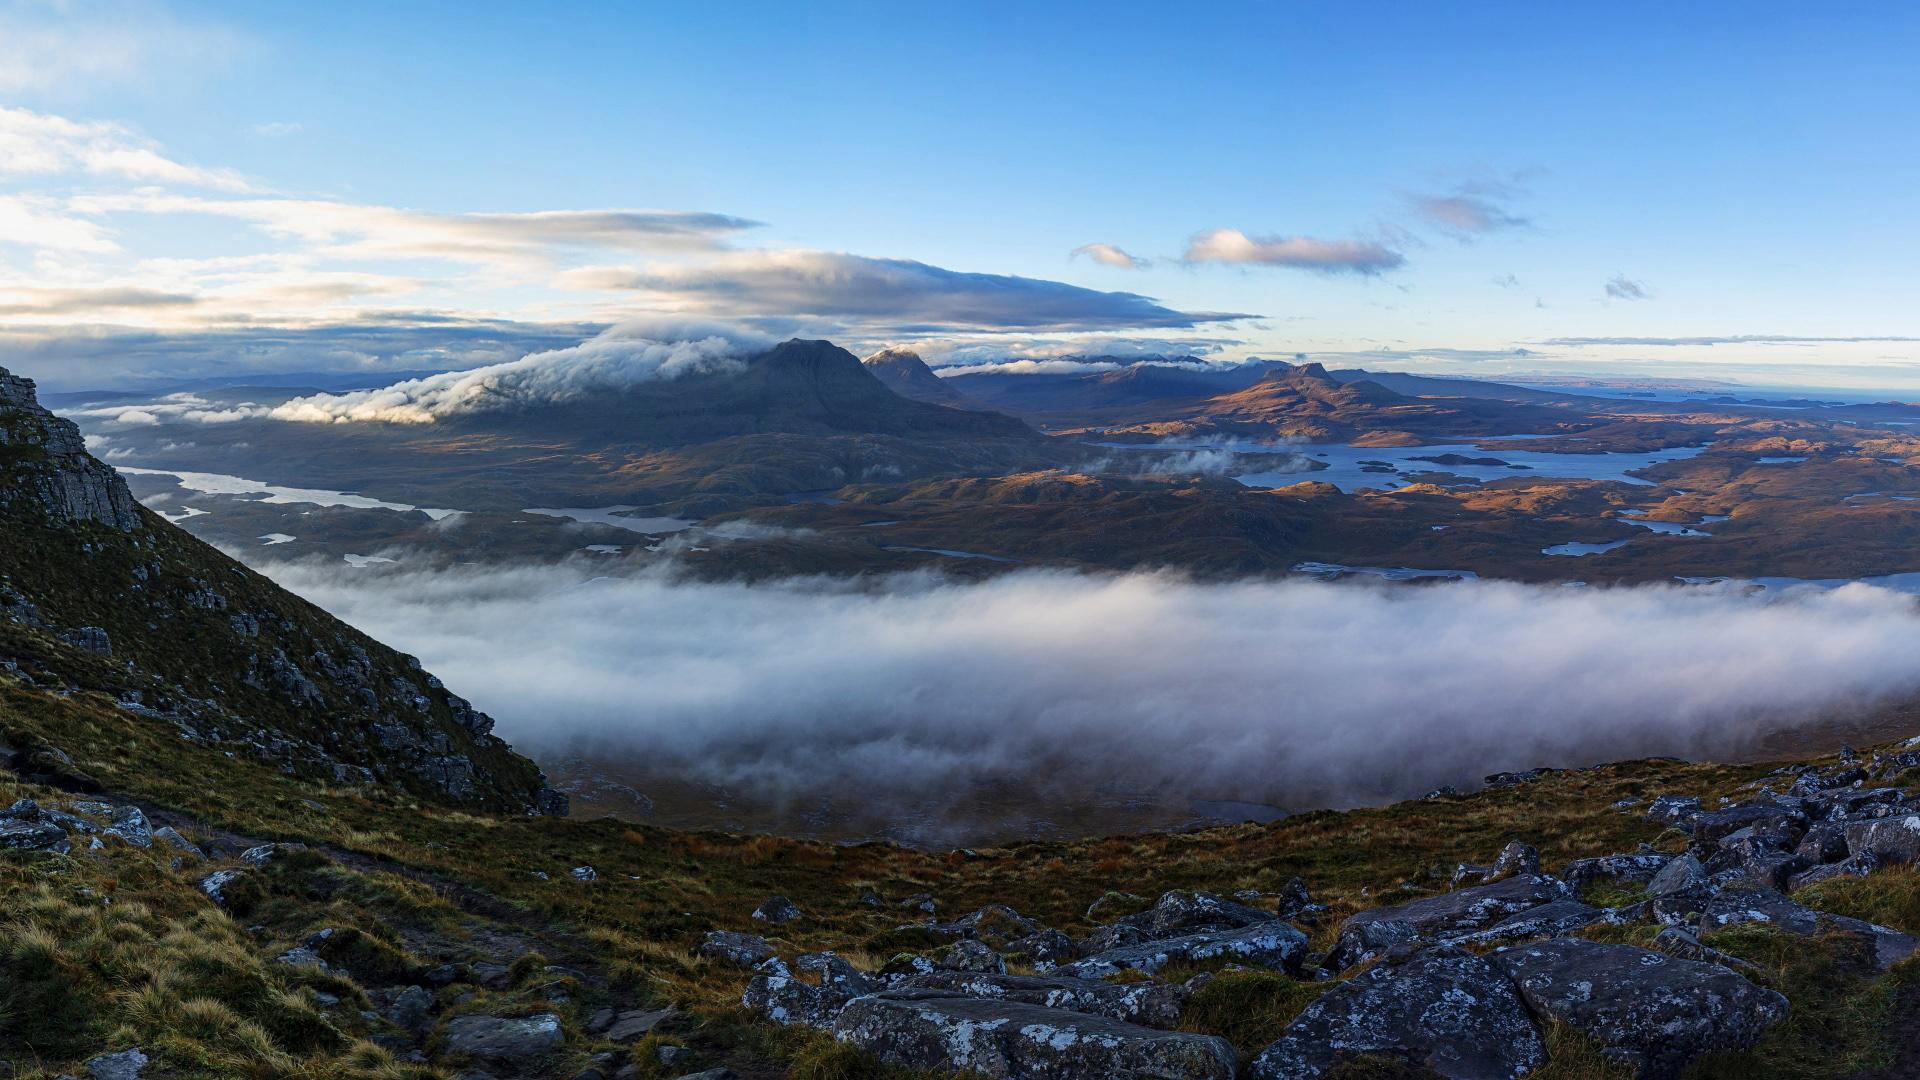 Hinh nen phong canh tuyet dep cua vung Torridon - Scotland